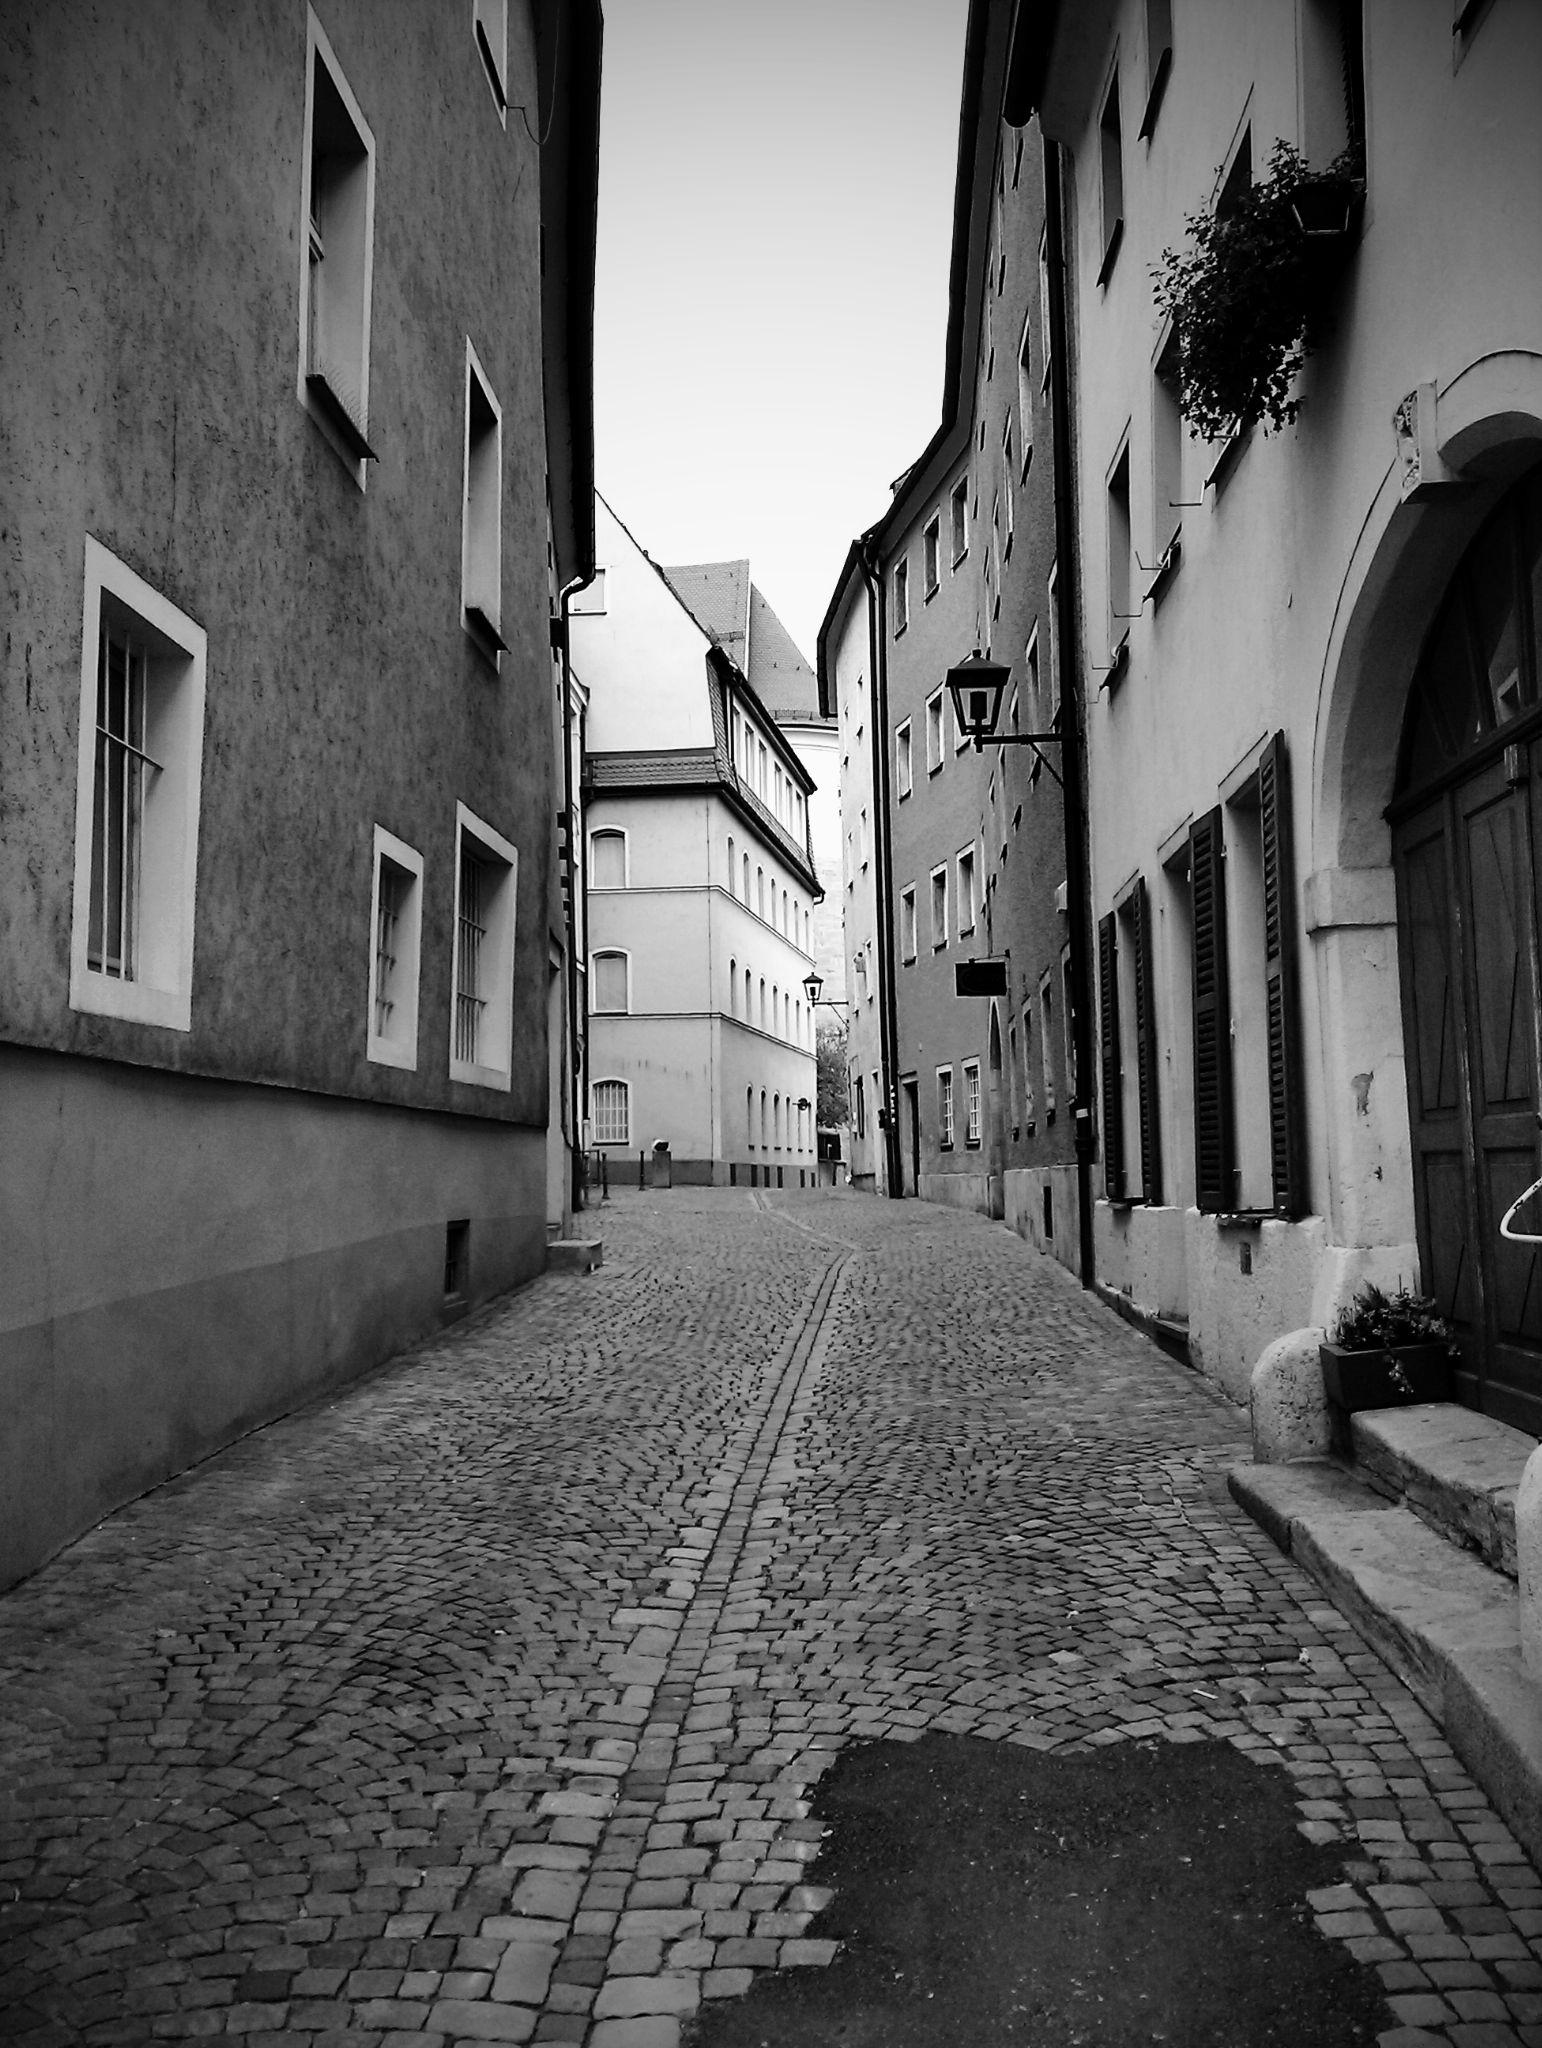 Old city street by gabi.striblea